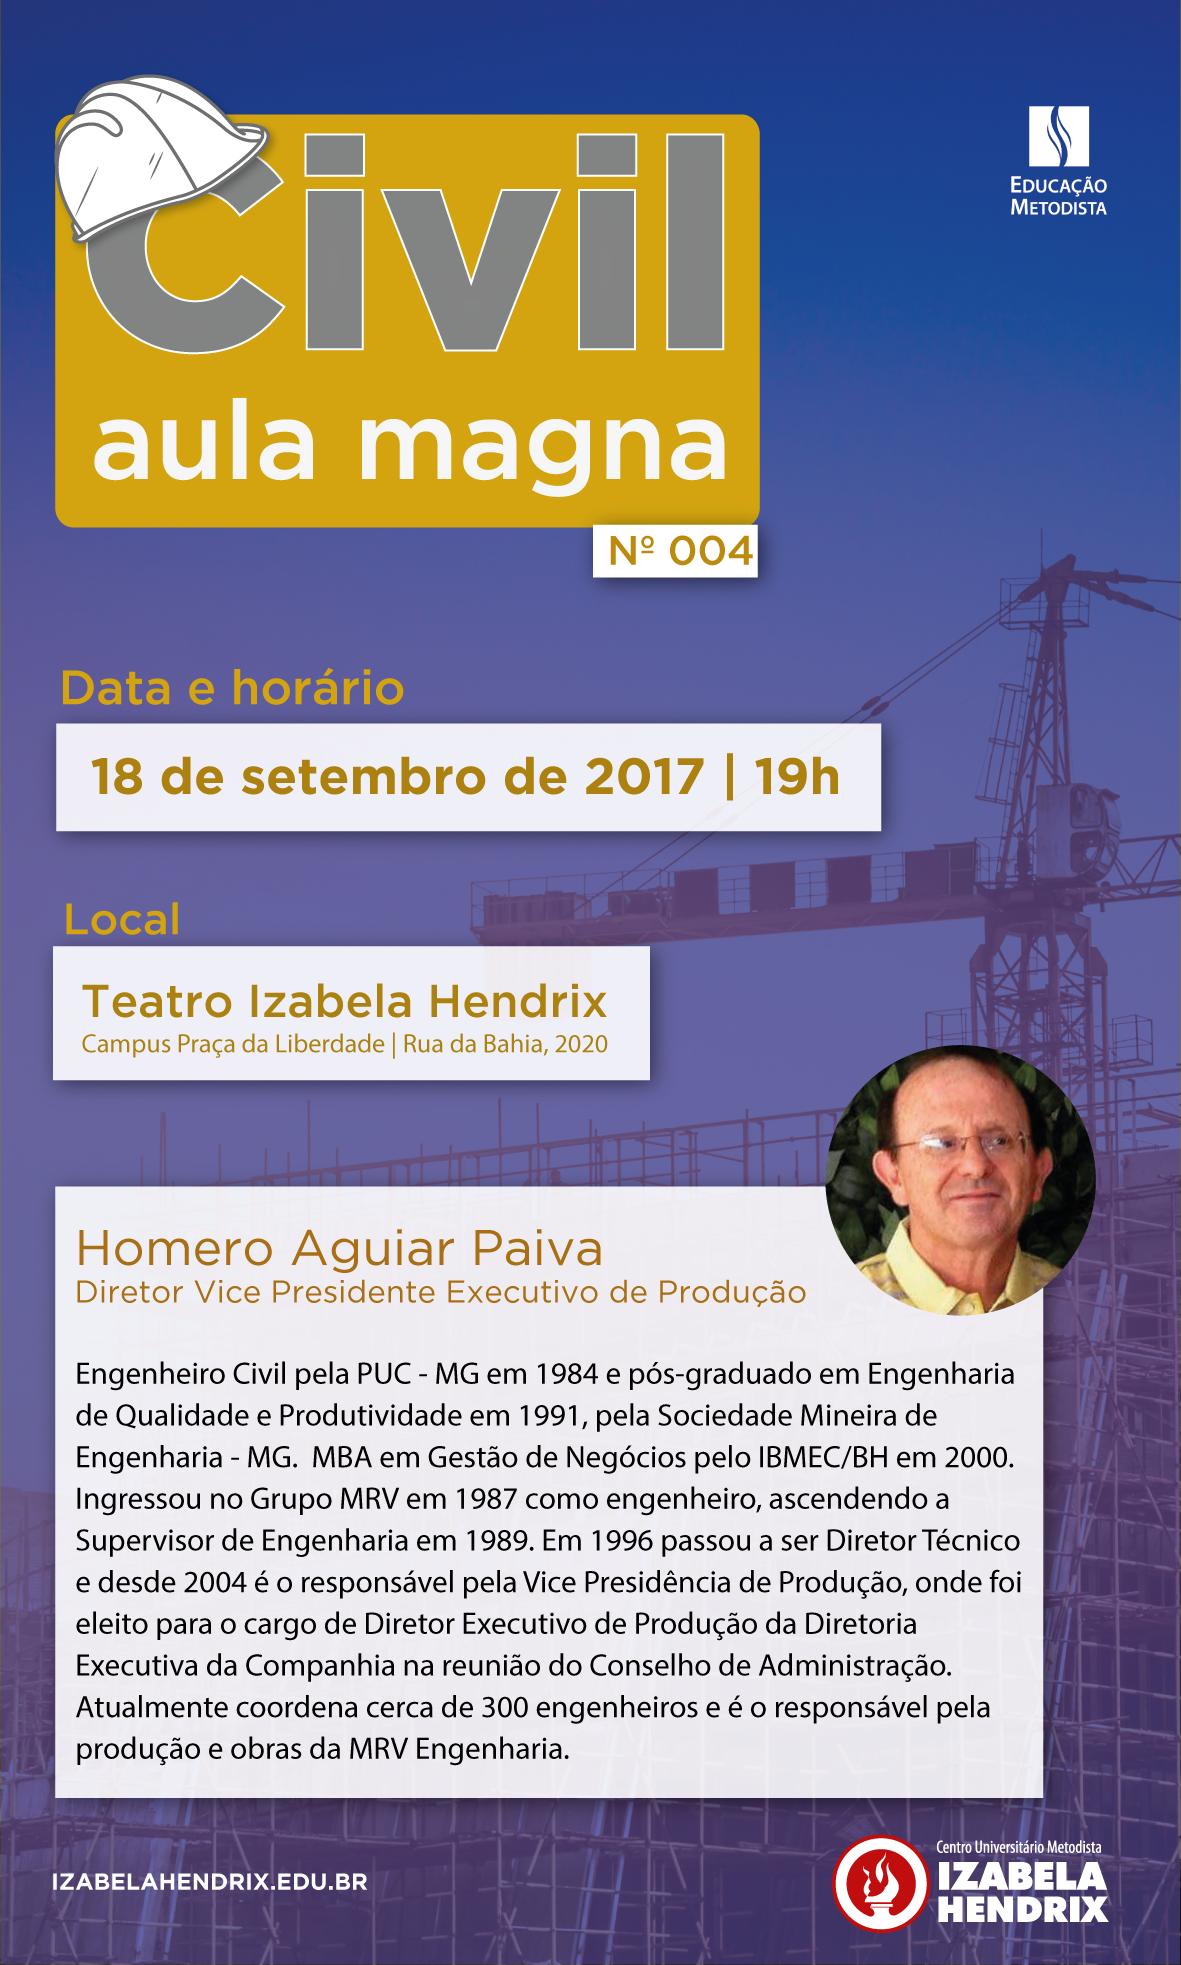 aula magna civil-01 (1).png